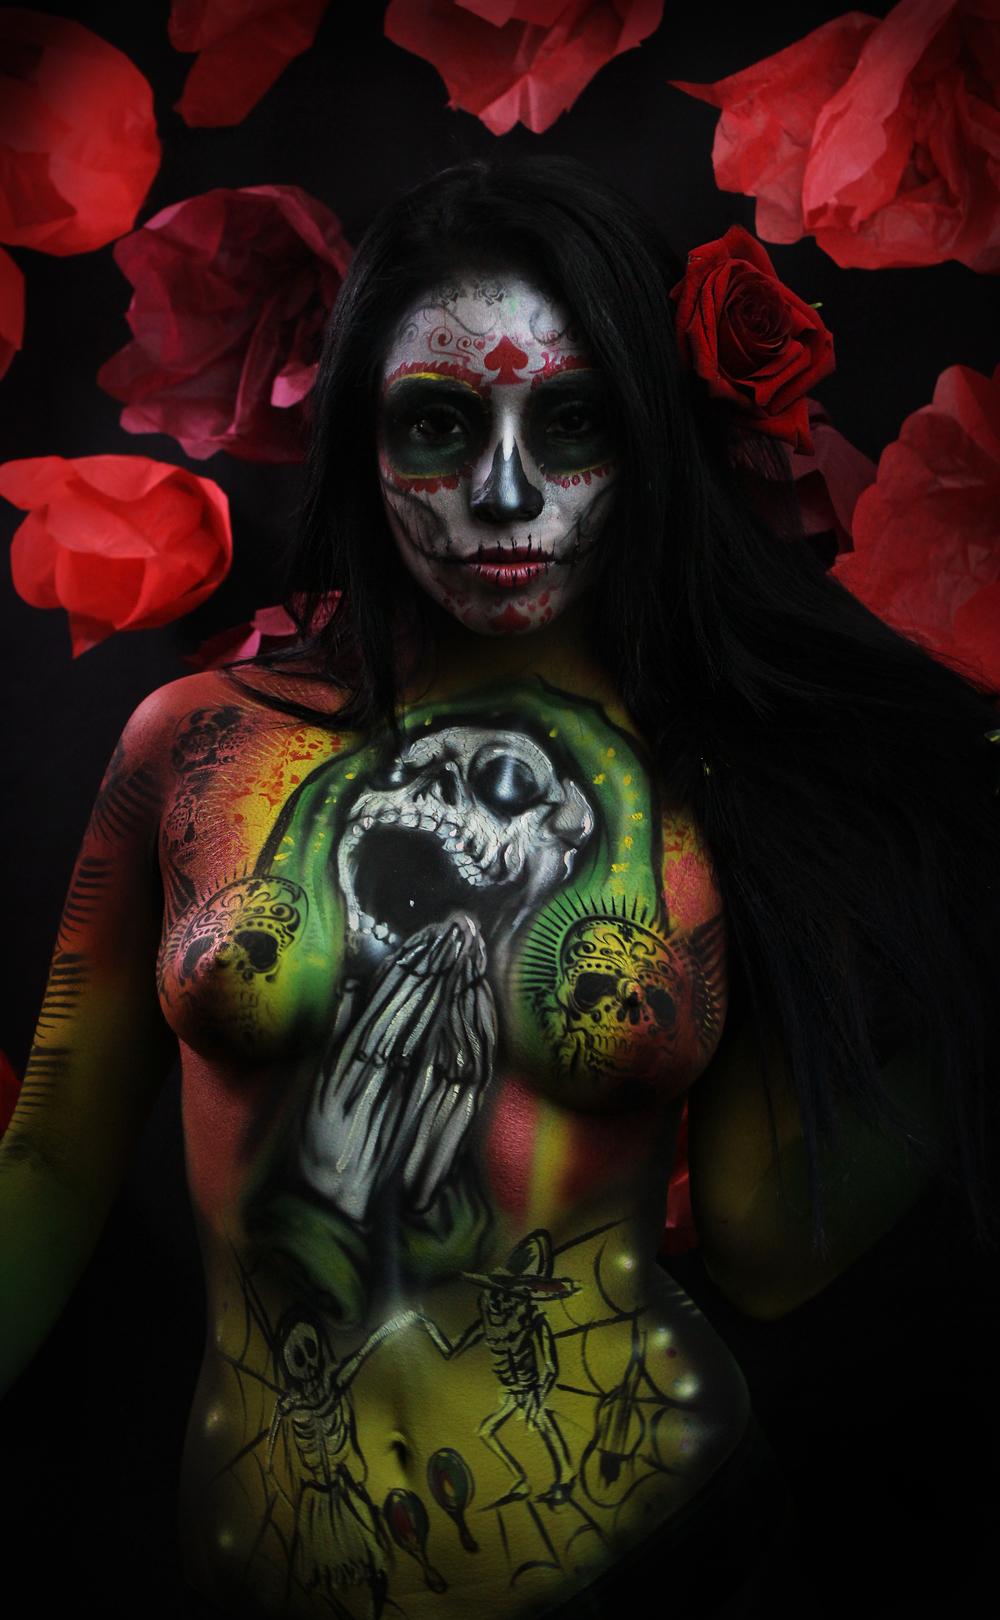 Cinco De mayo Body paint with skull